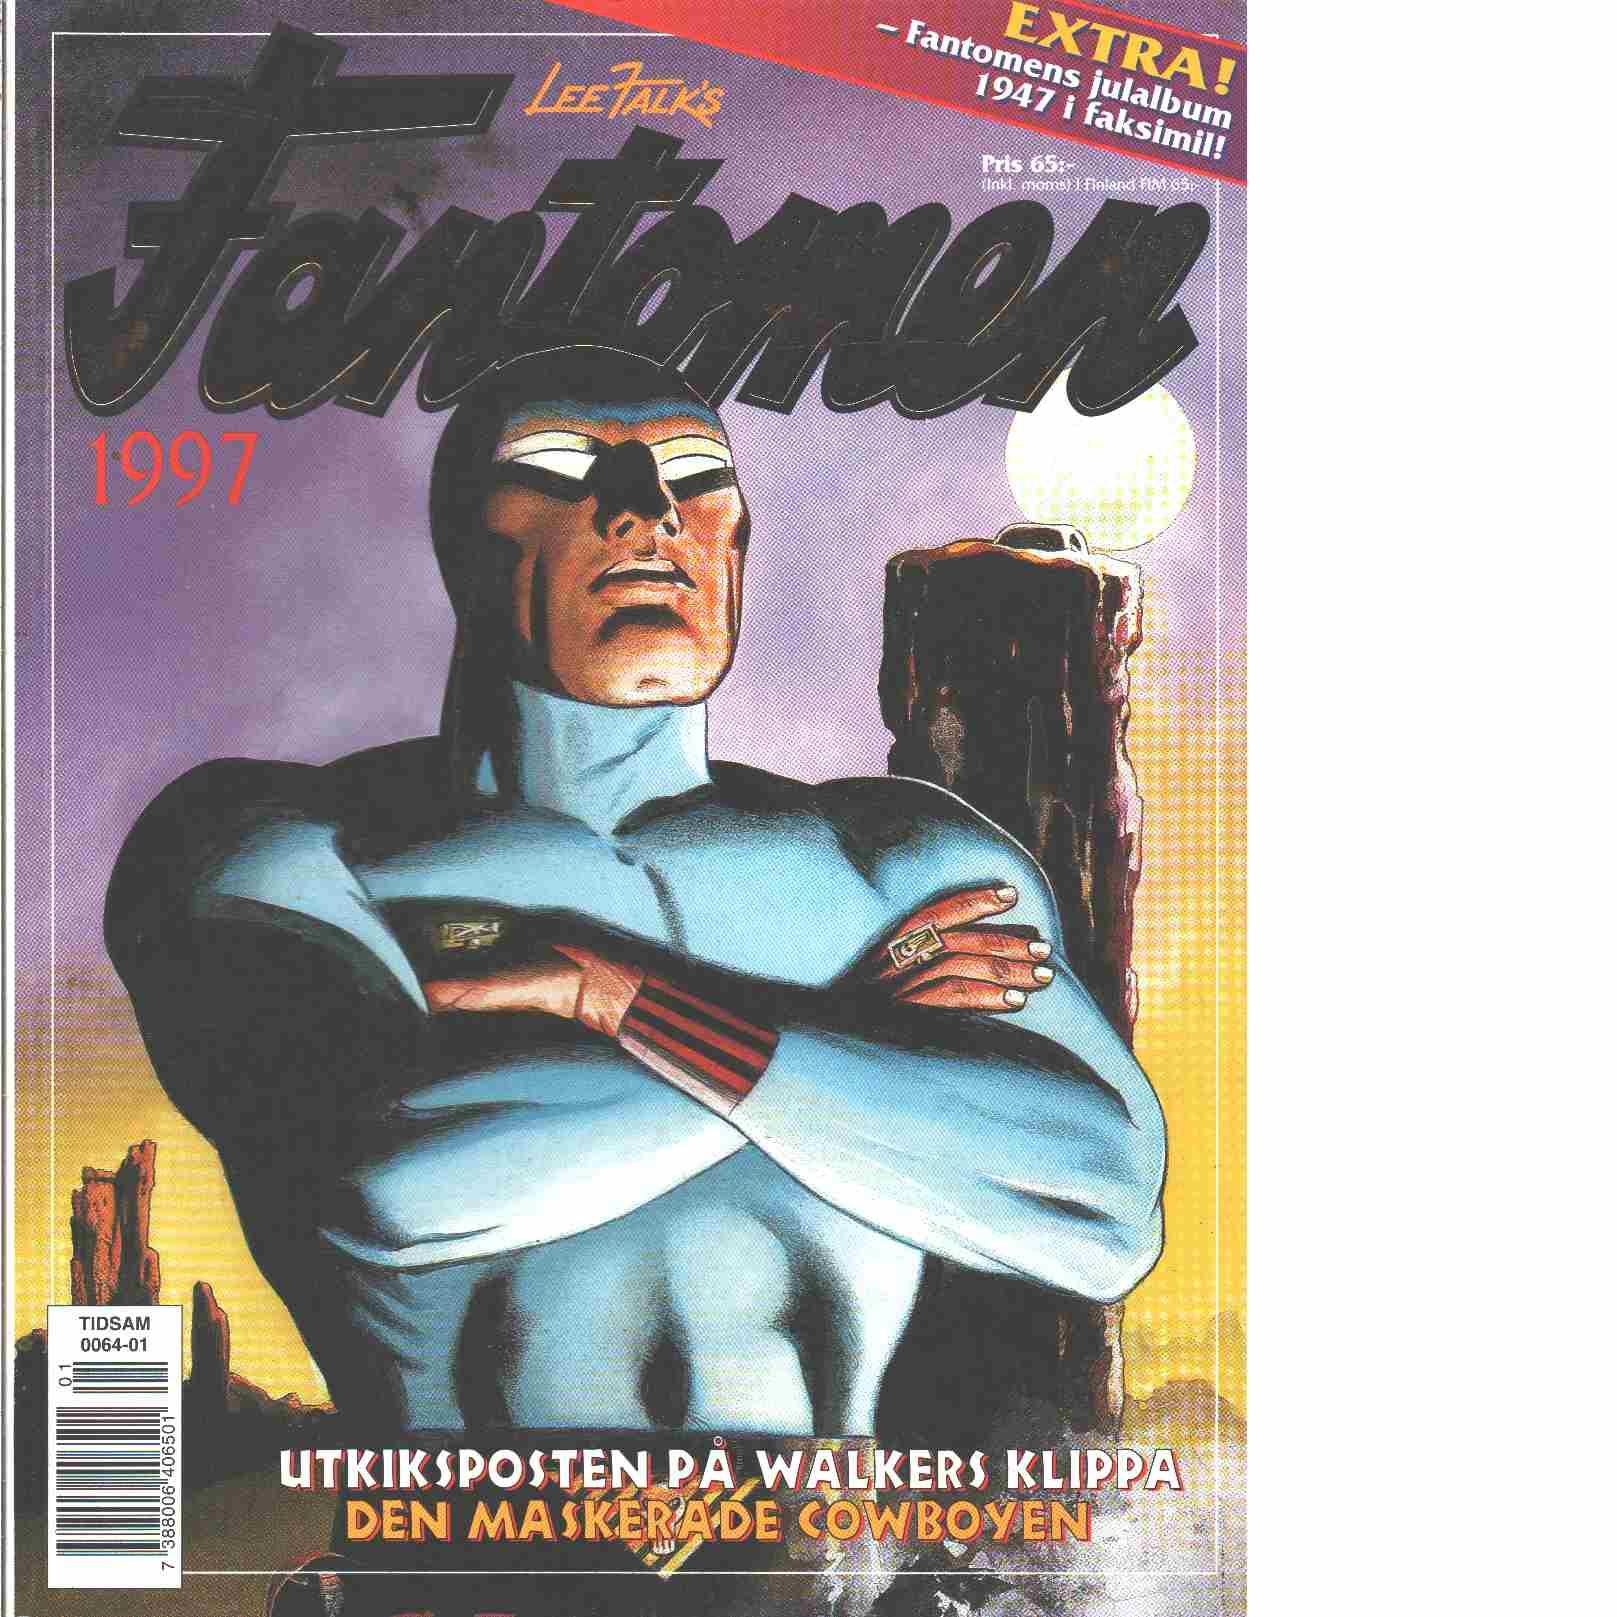 Lee Falk's Fantomen  - Falk, Lee